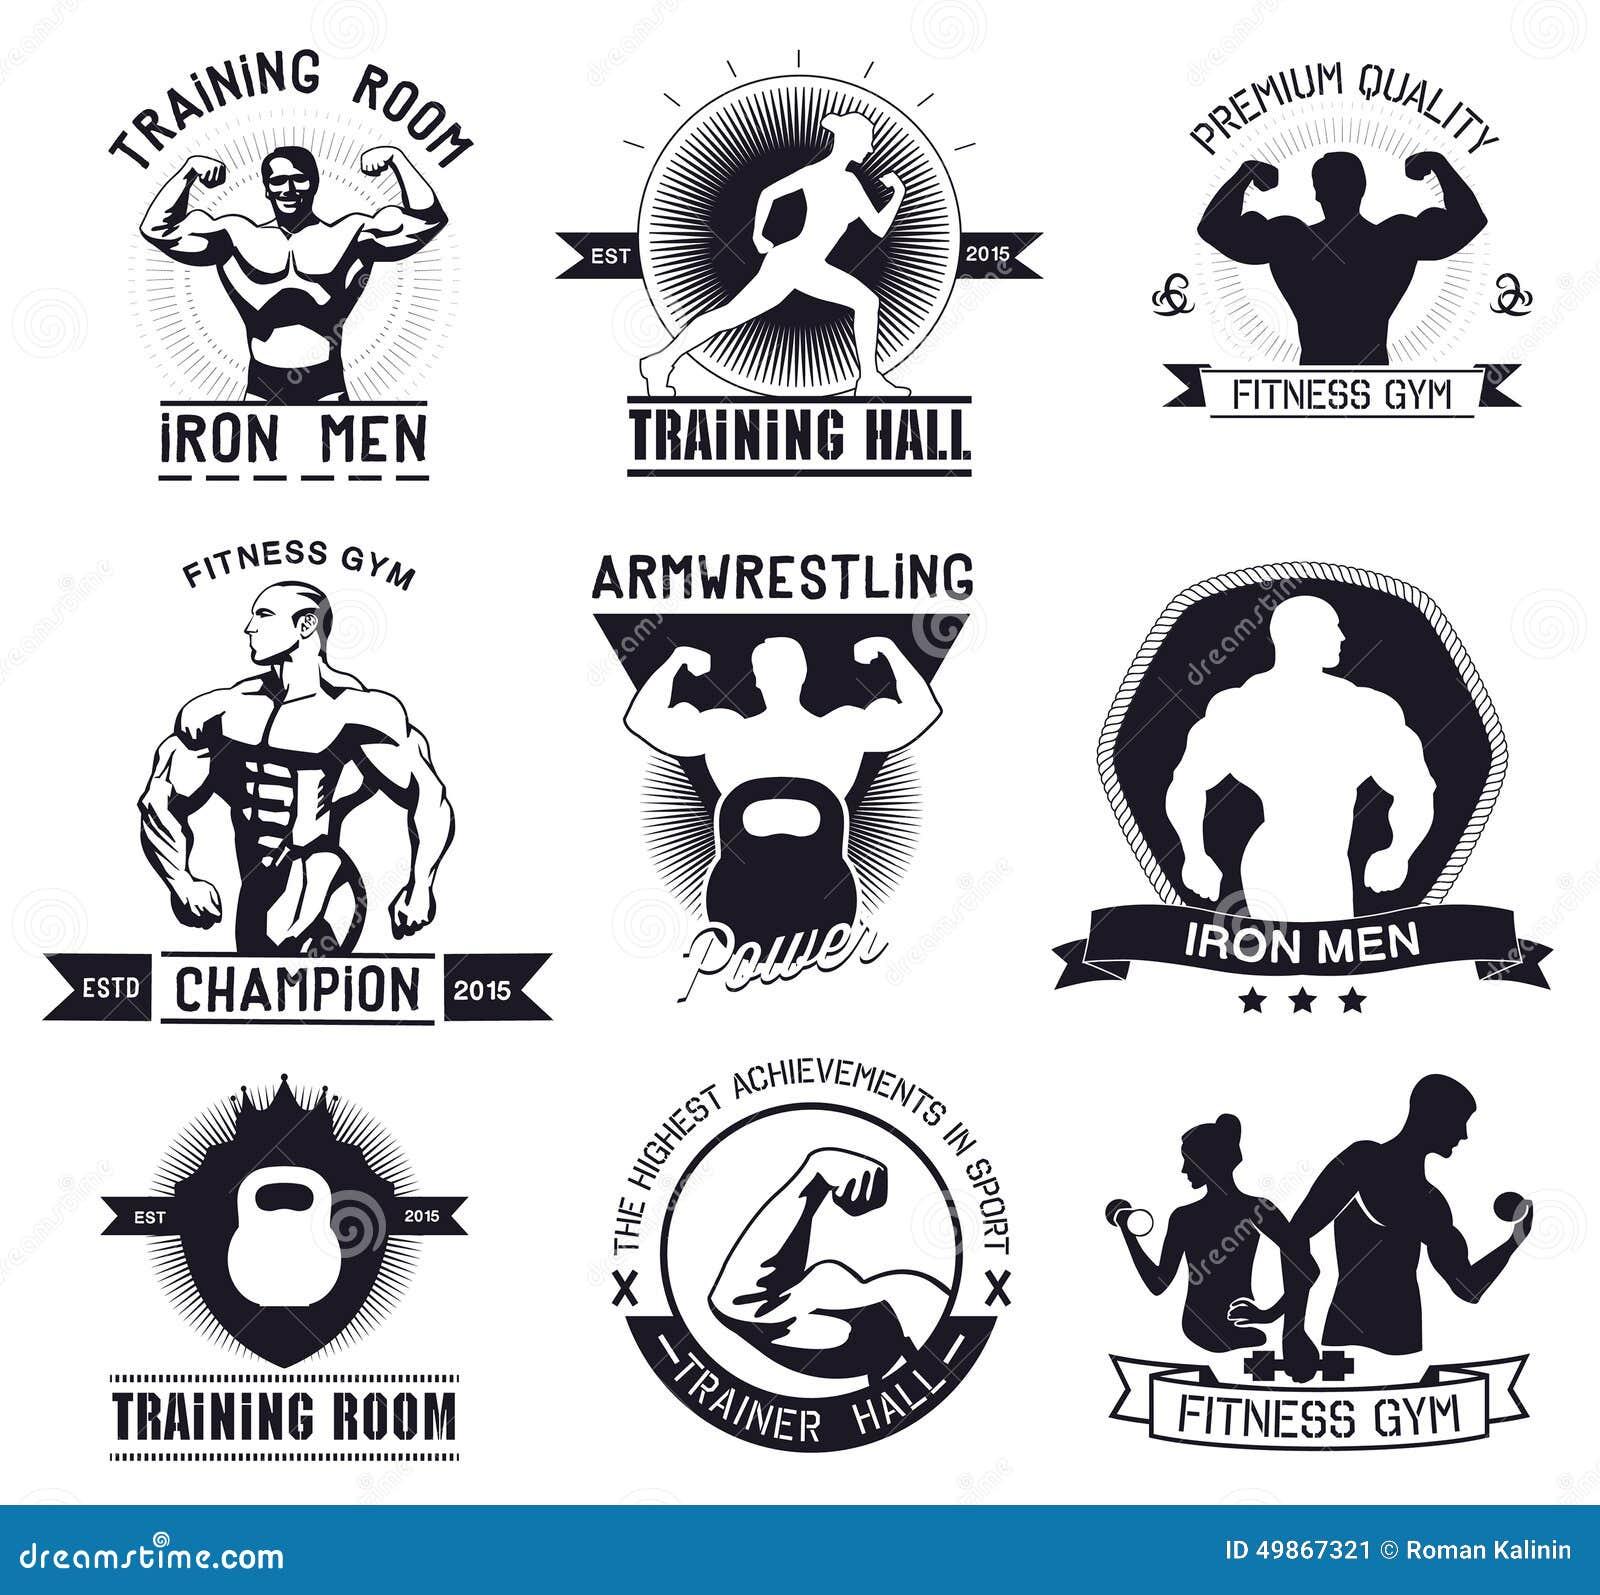 gladiator fitness